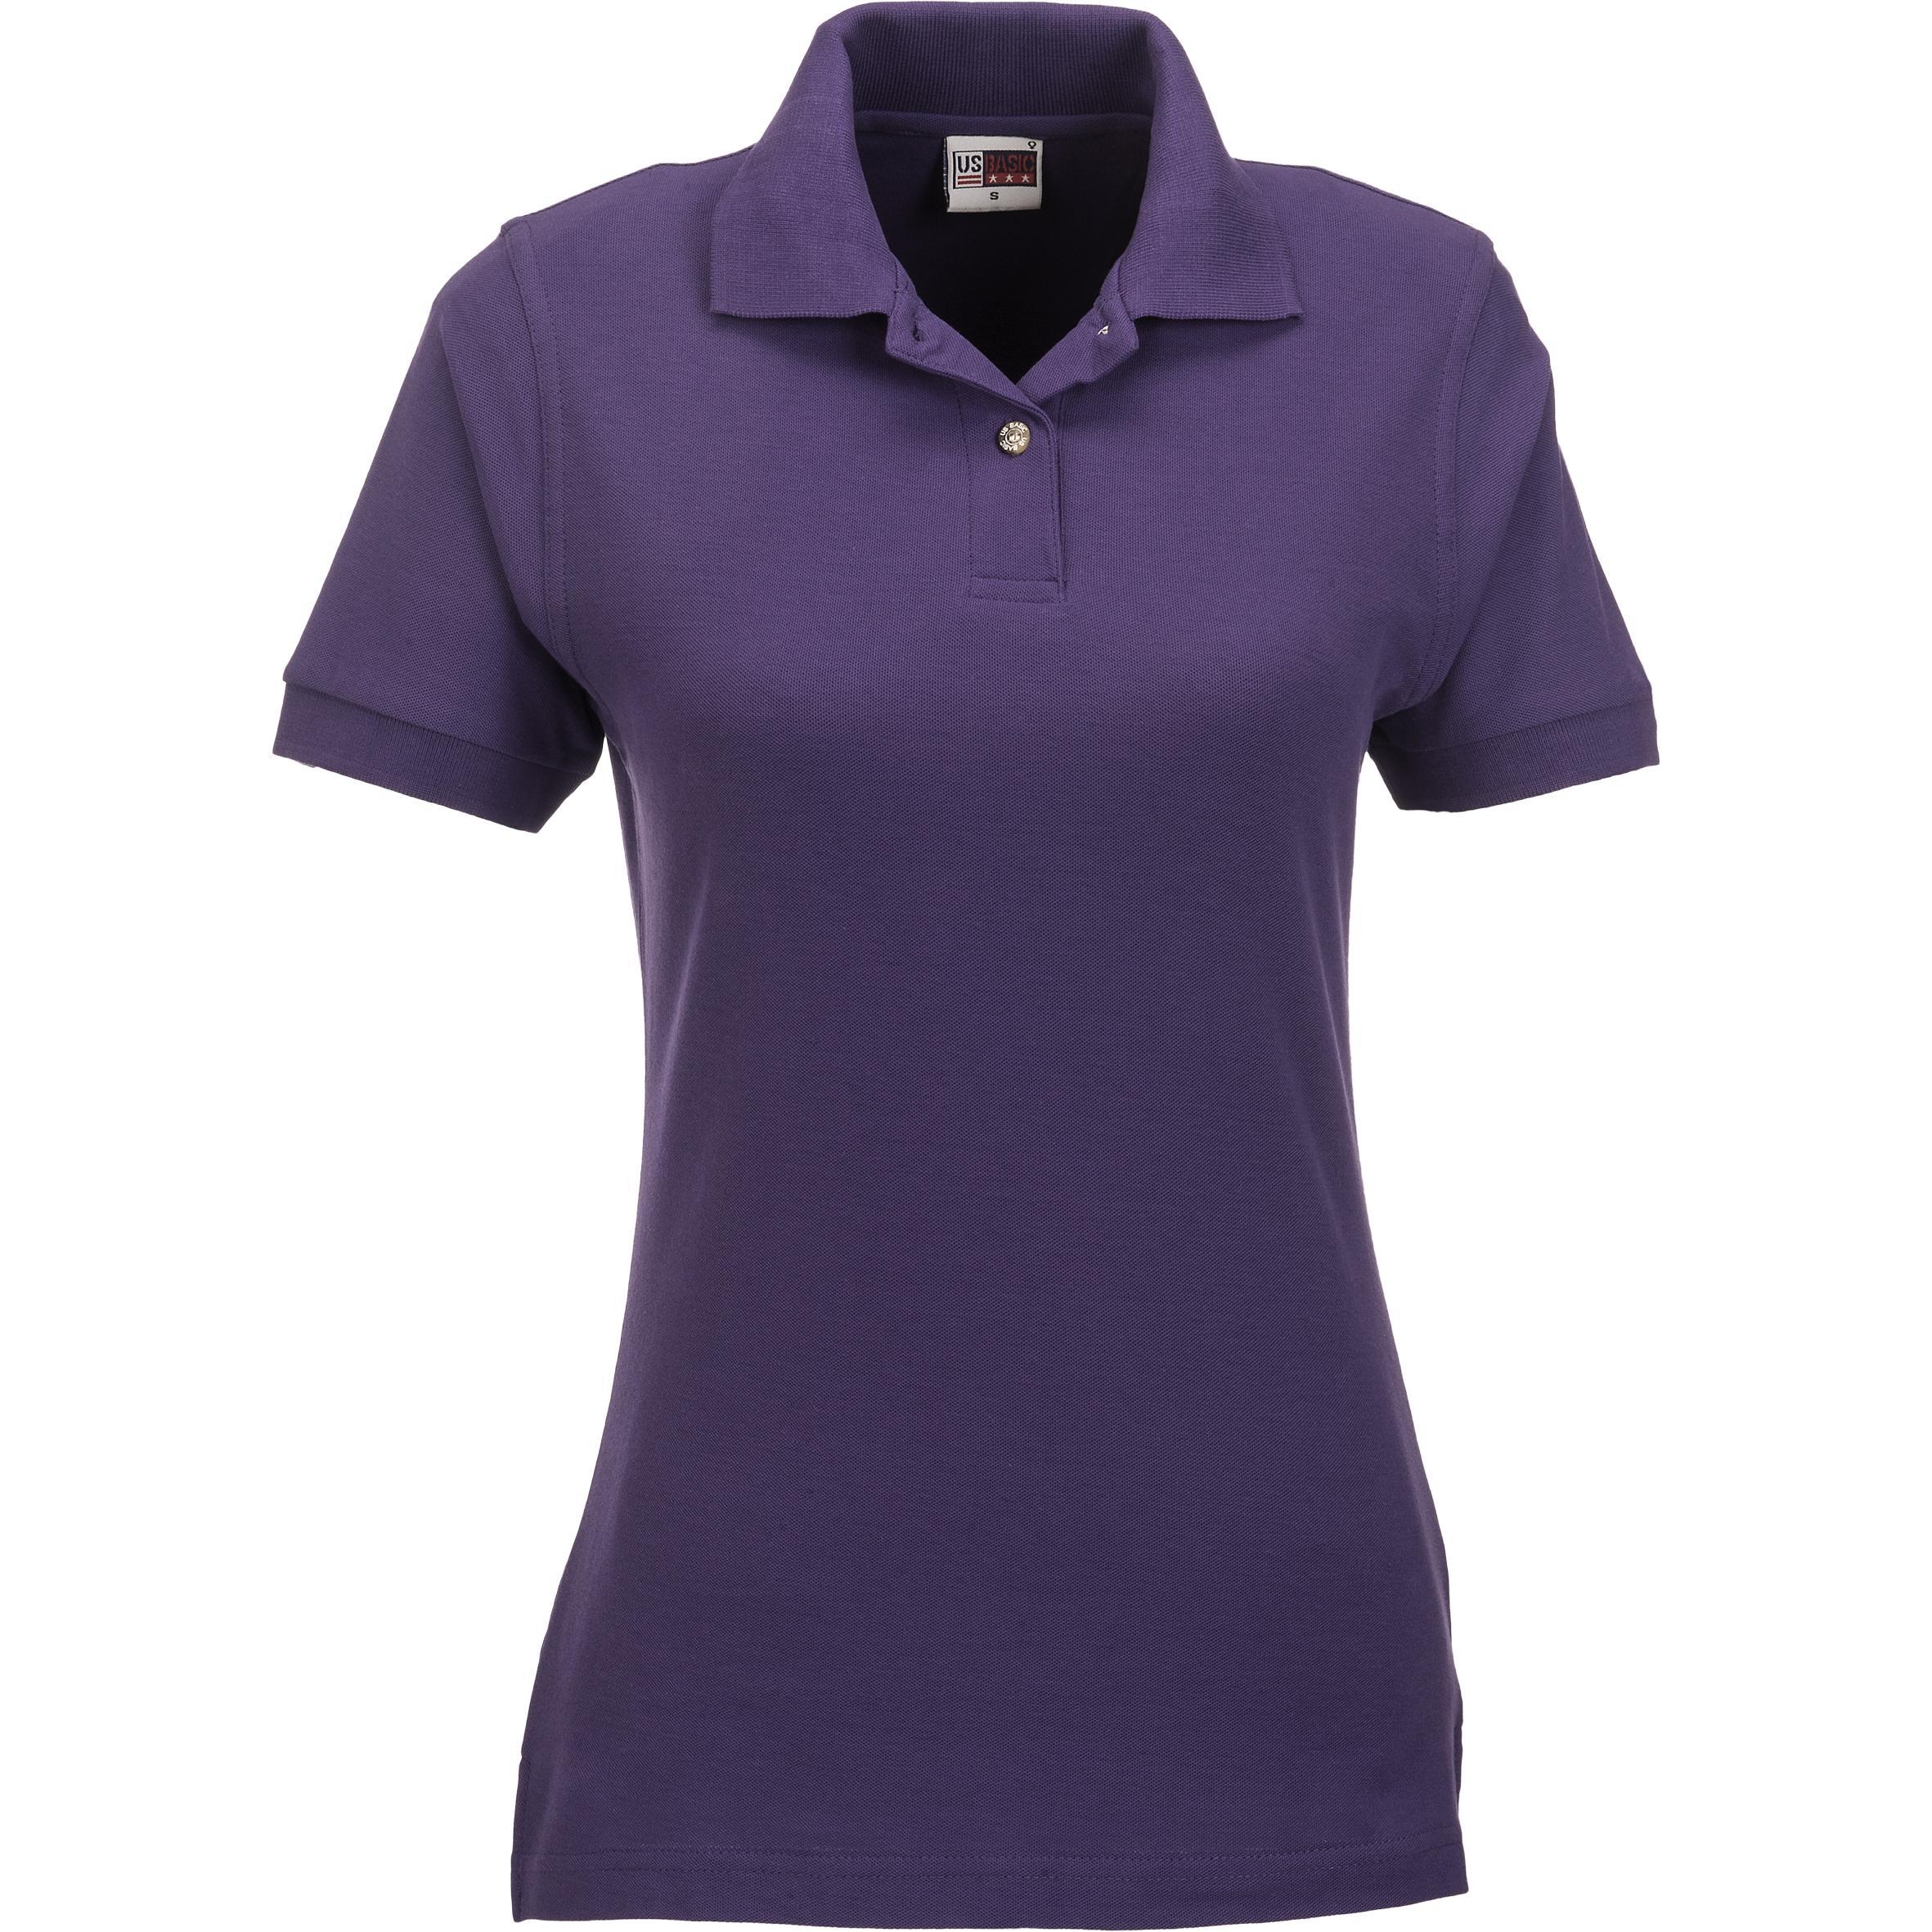 Ladies Boston Golf Shirt - Purple Only